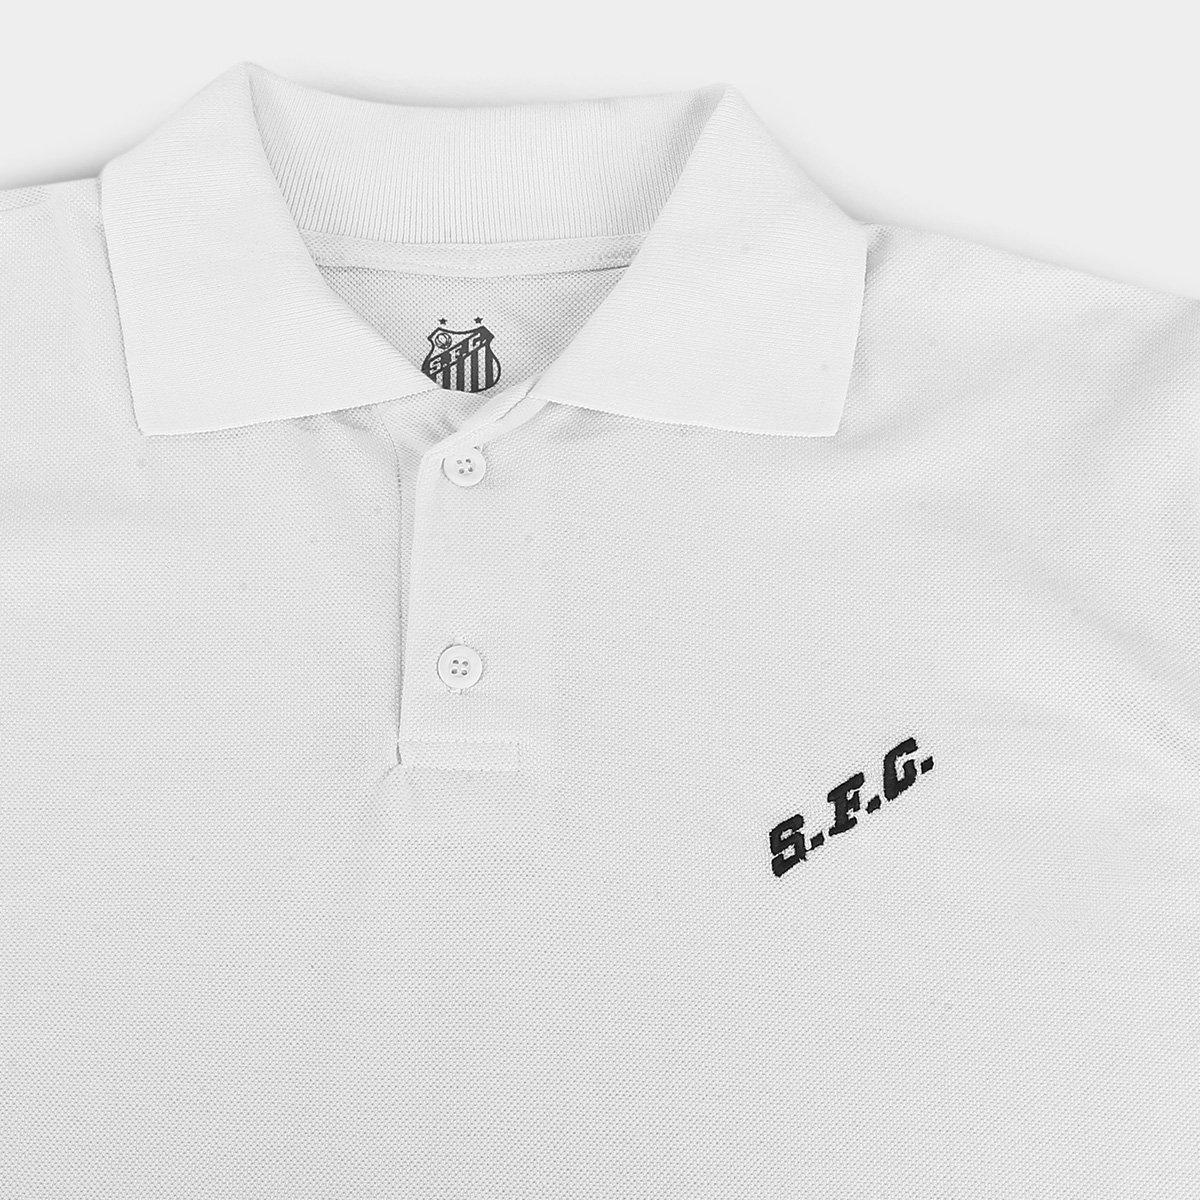 Camisa Polo Santos FC Masculina - Tam: P - 2